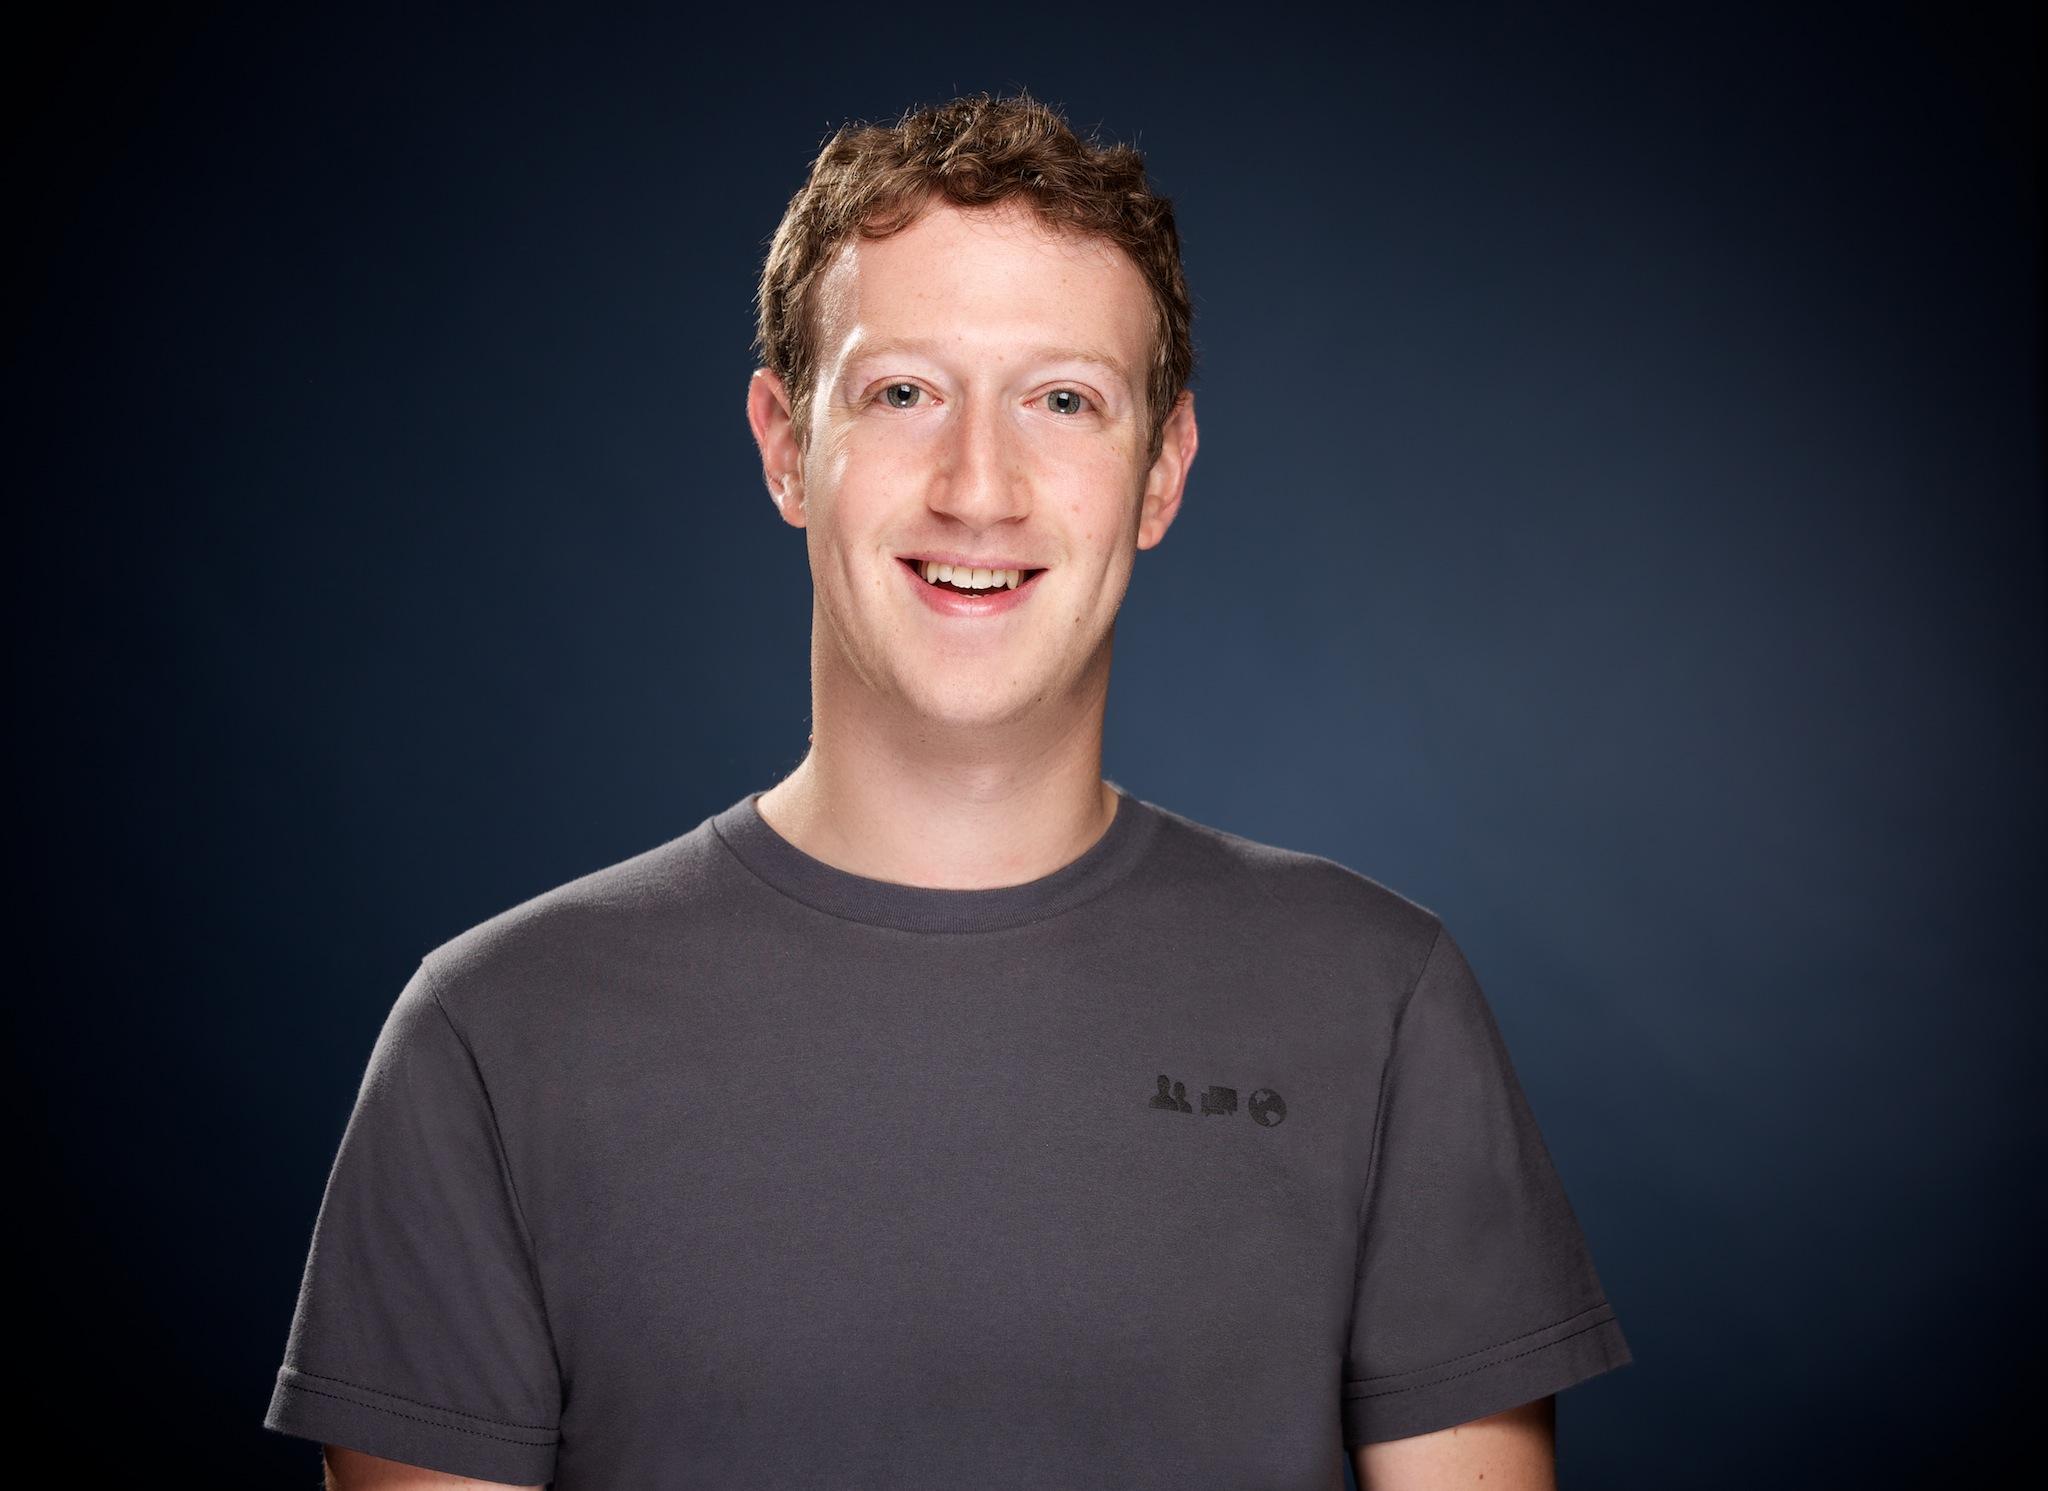 Zuckerberg sells $95 mn in Facebook stock